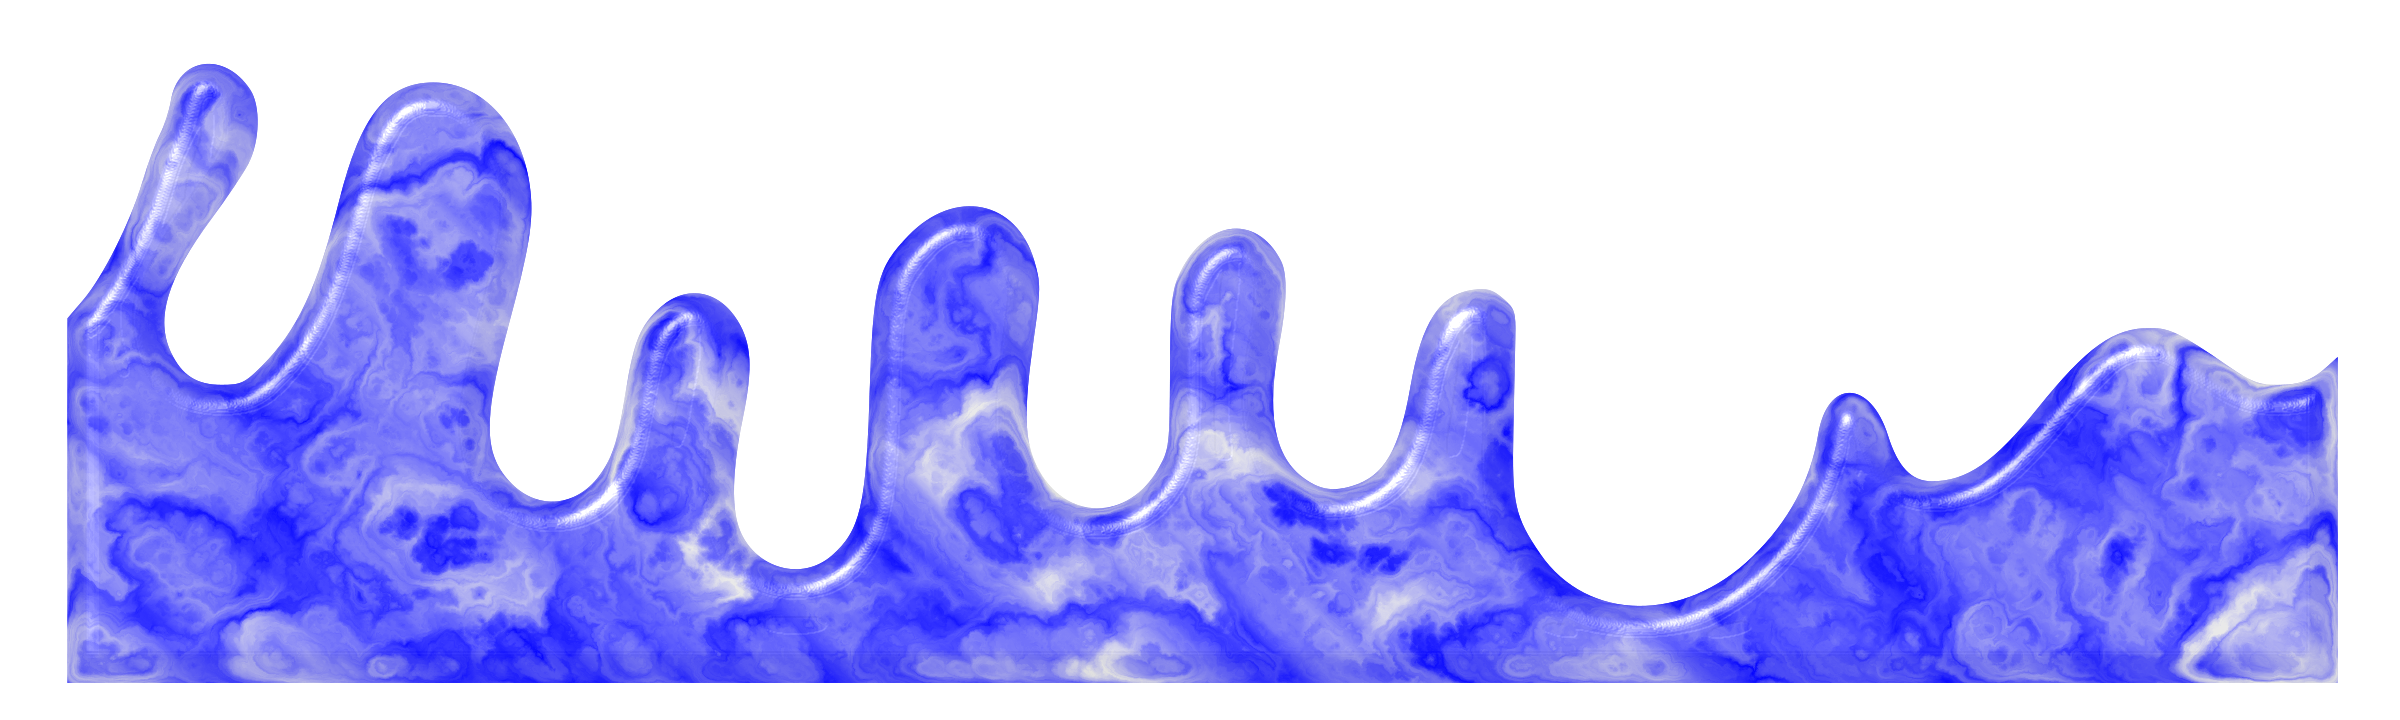 Fluid Clip Art.